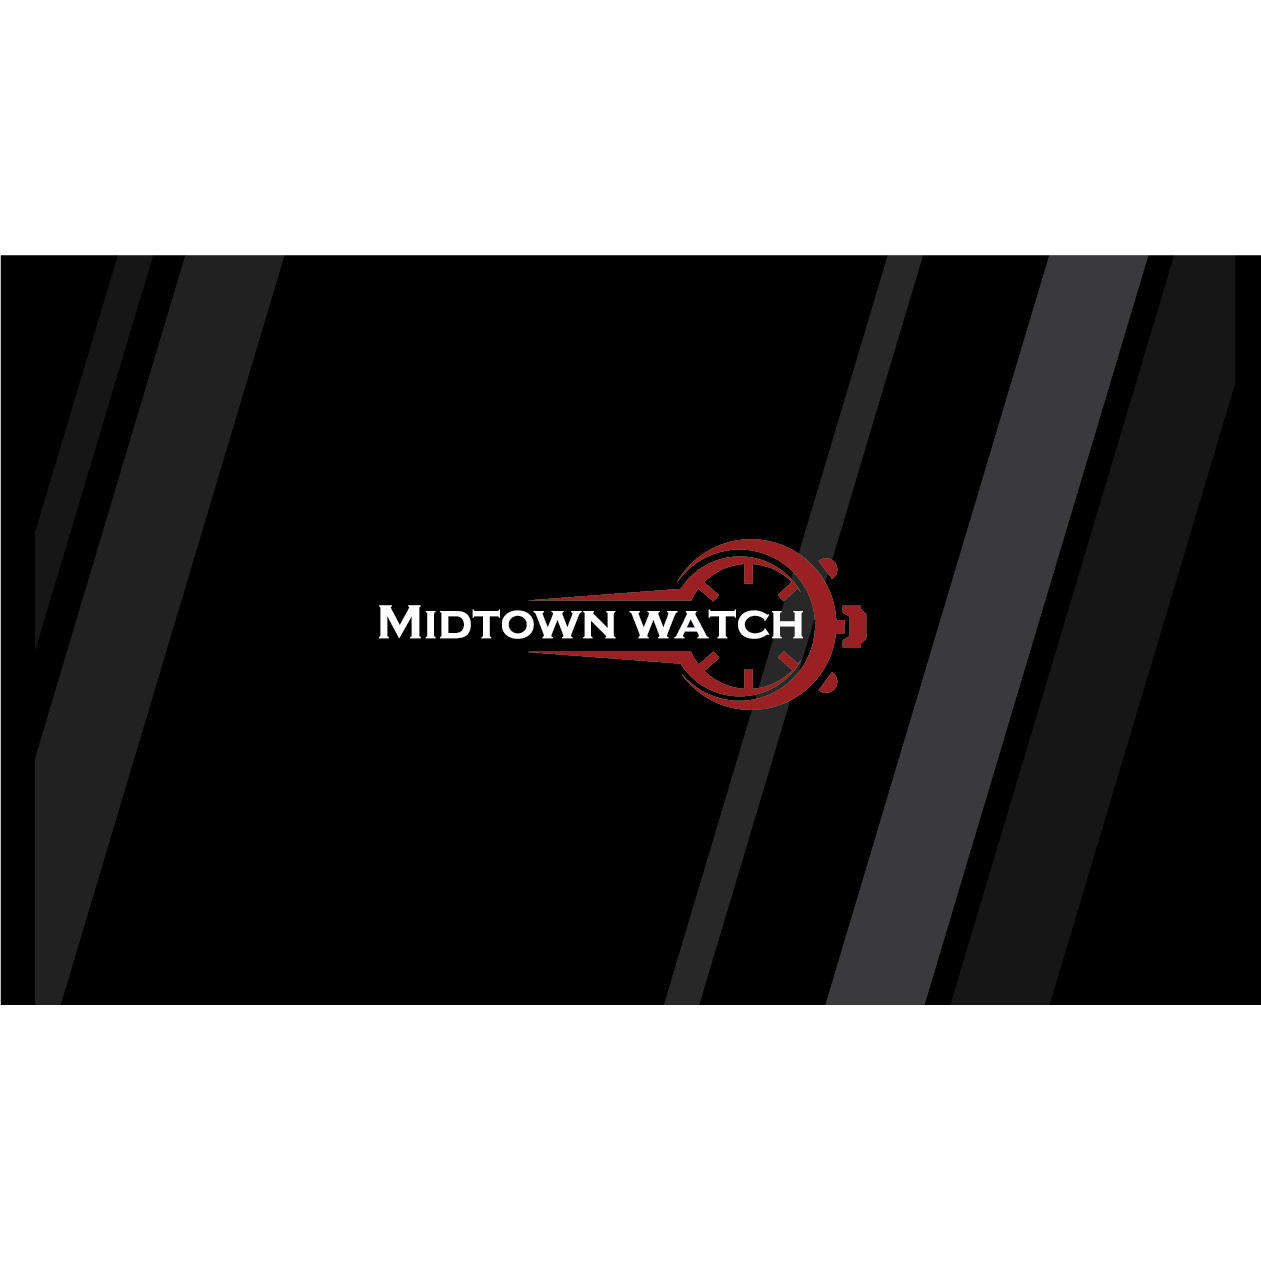 Midtown Watch image 5